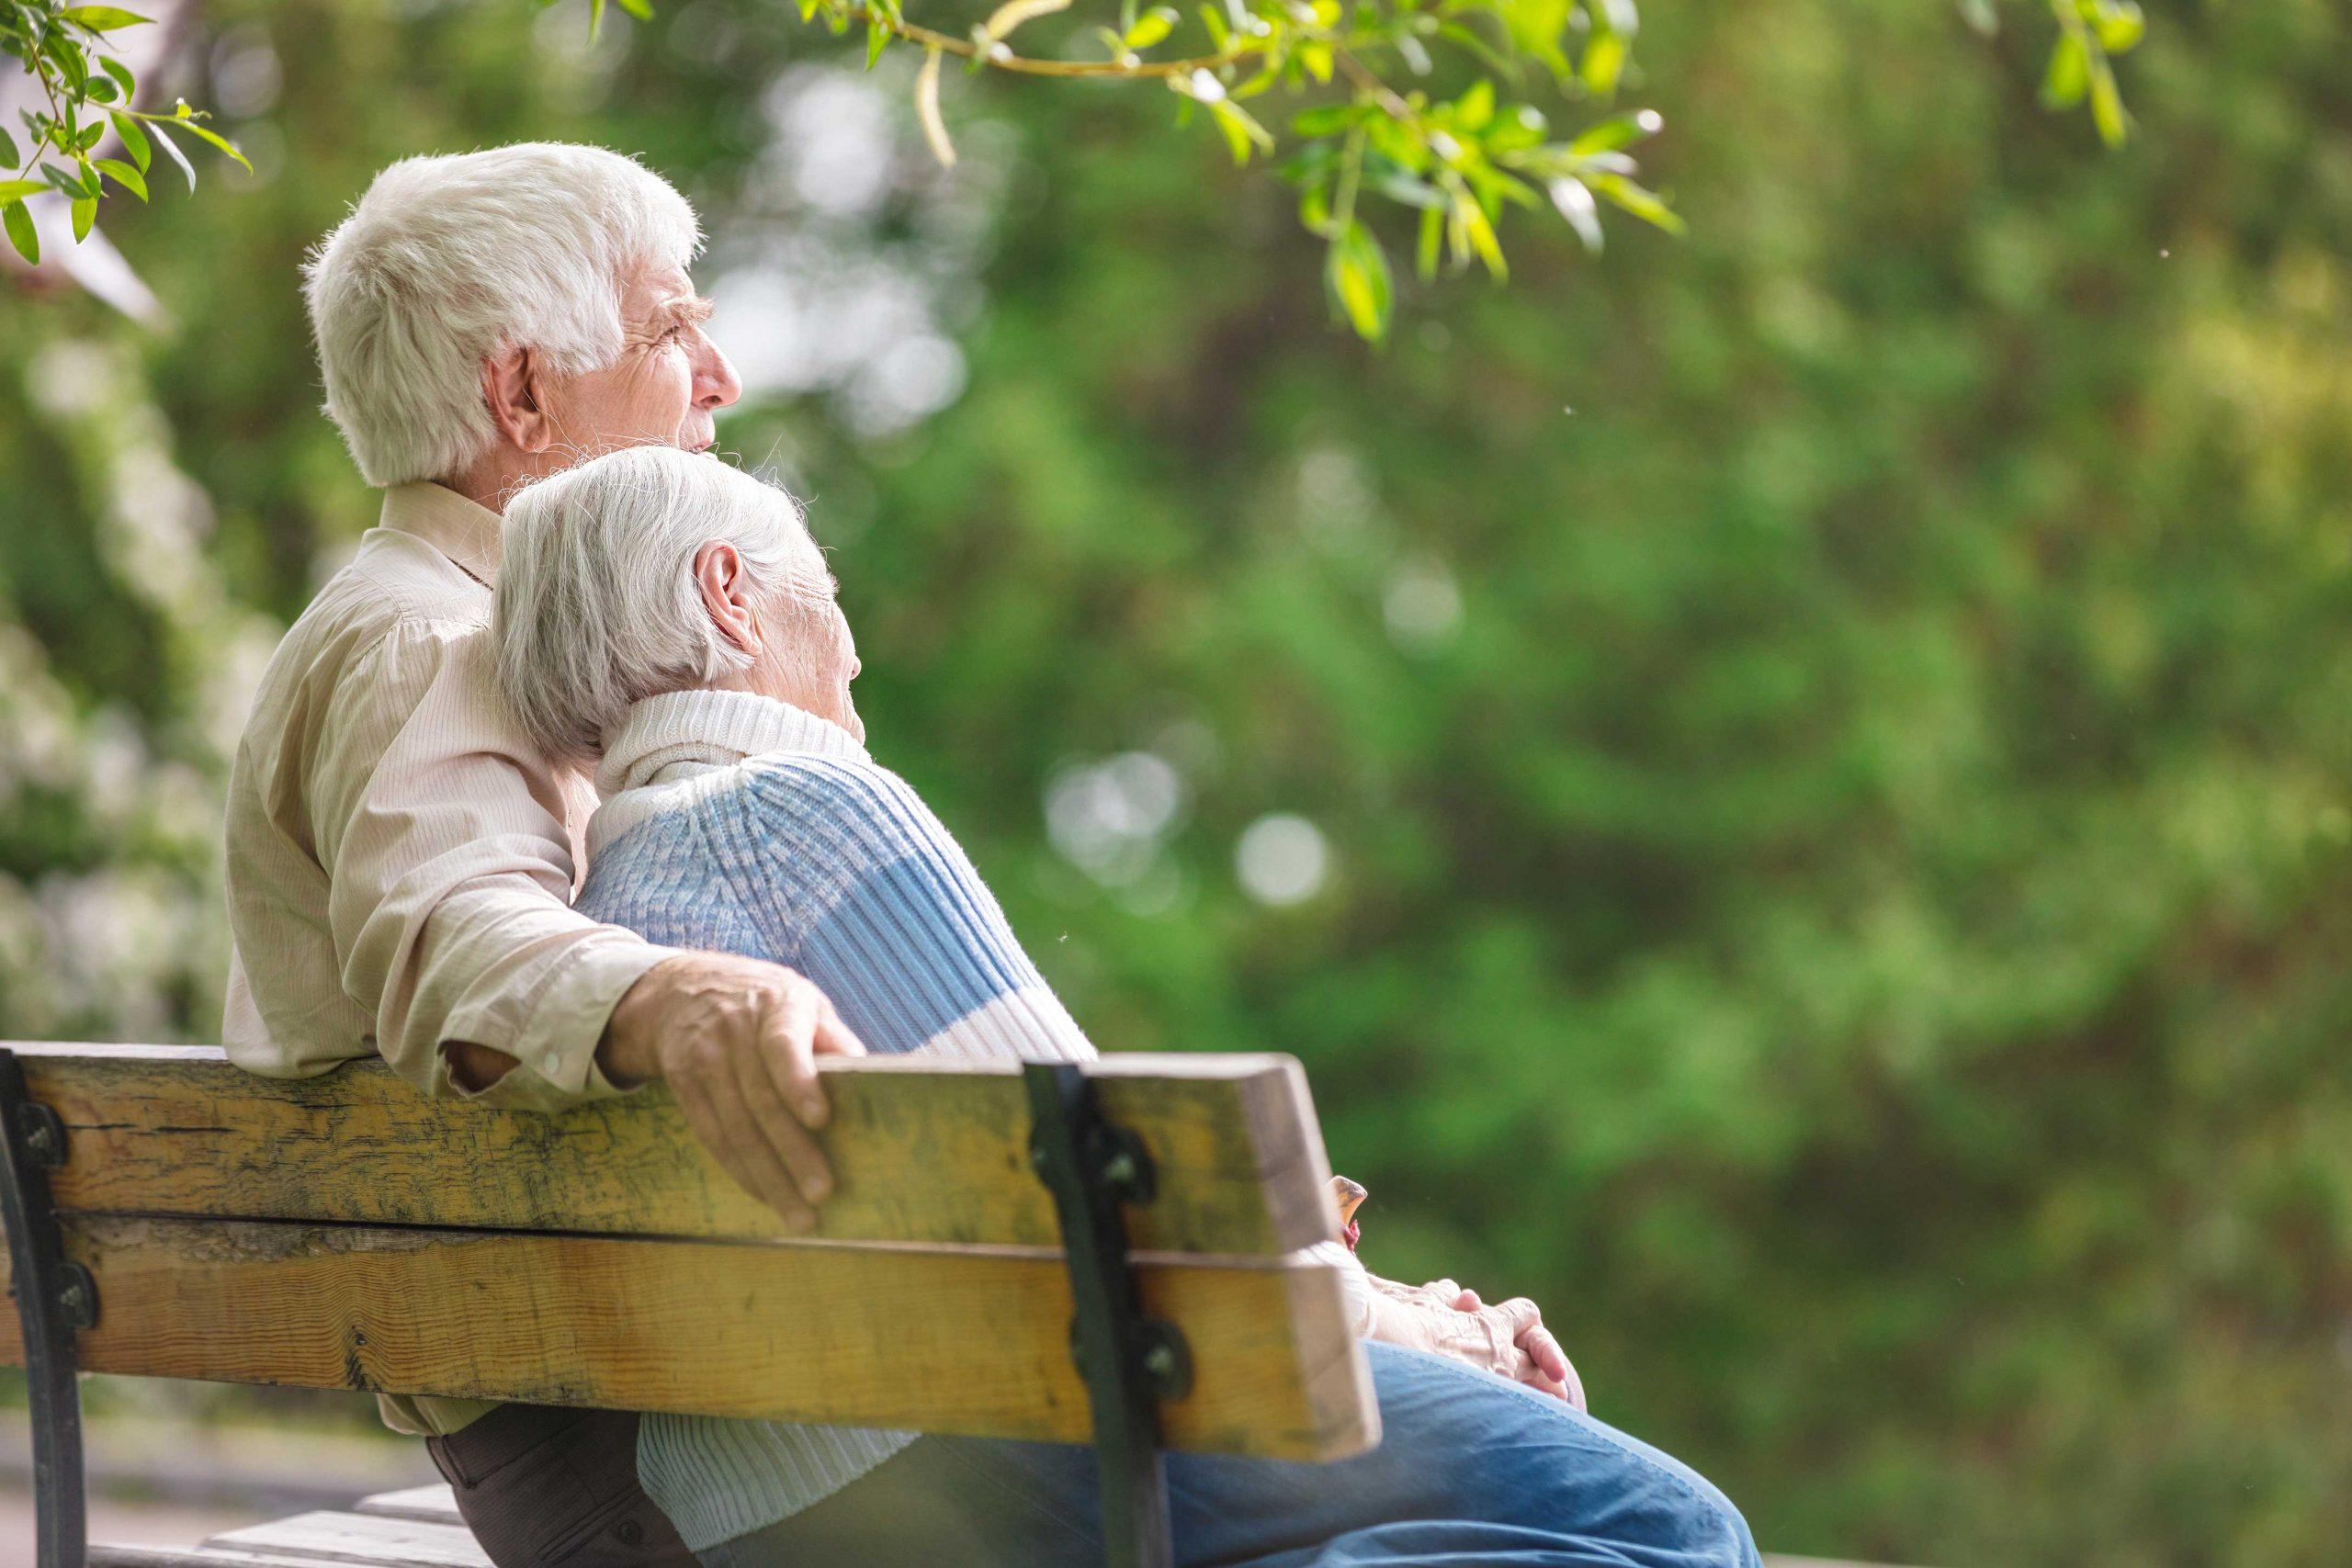 Senior couple sitting together on bench outside